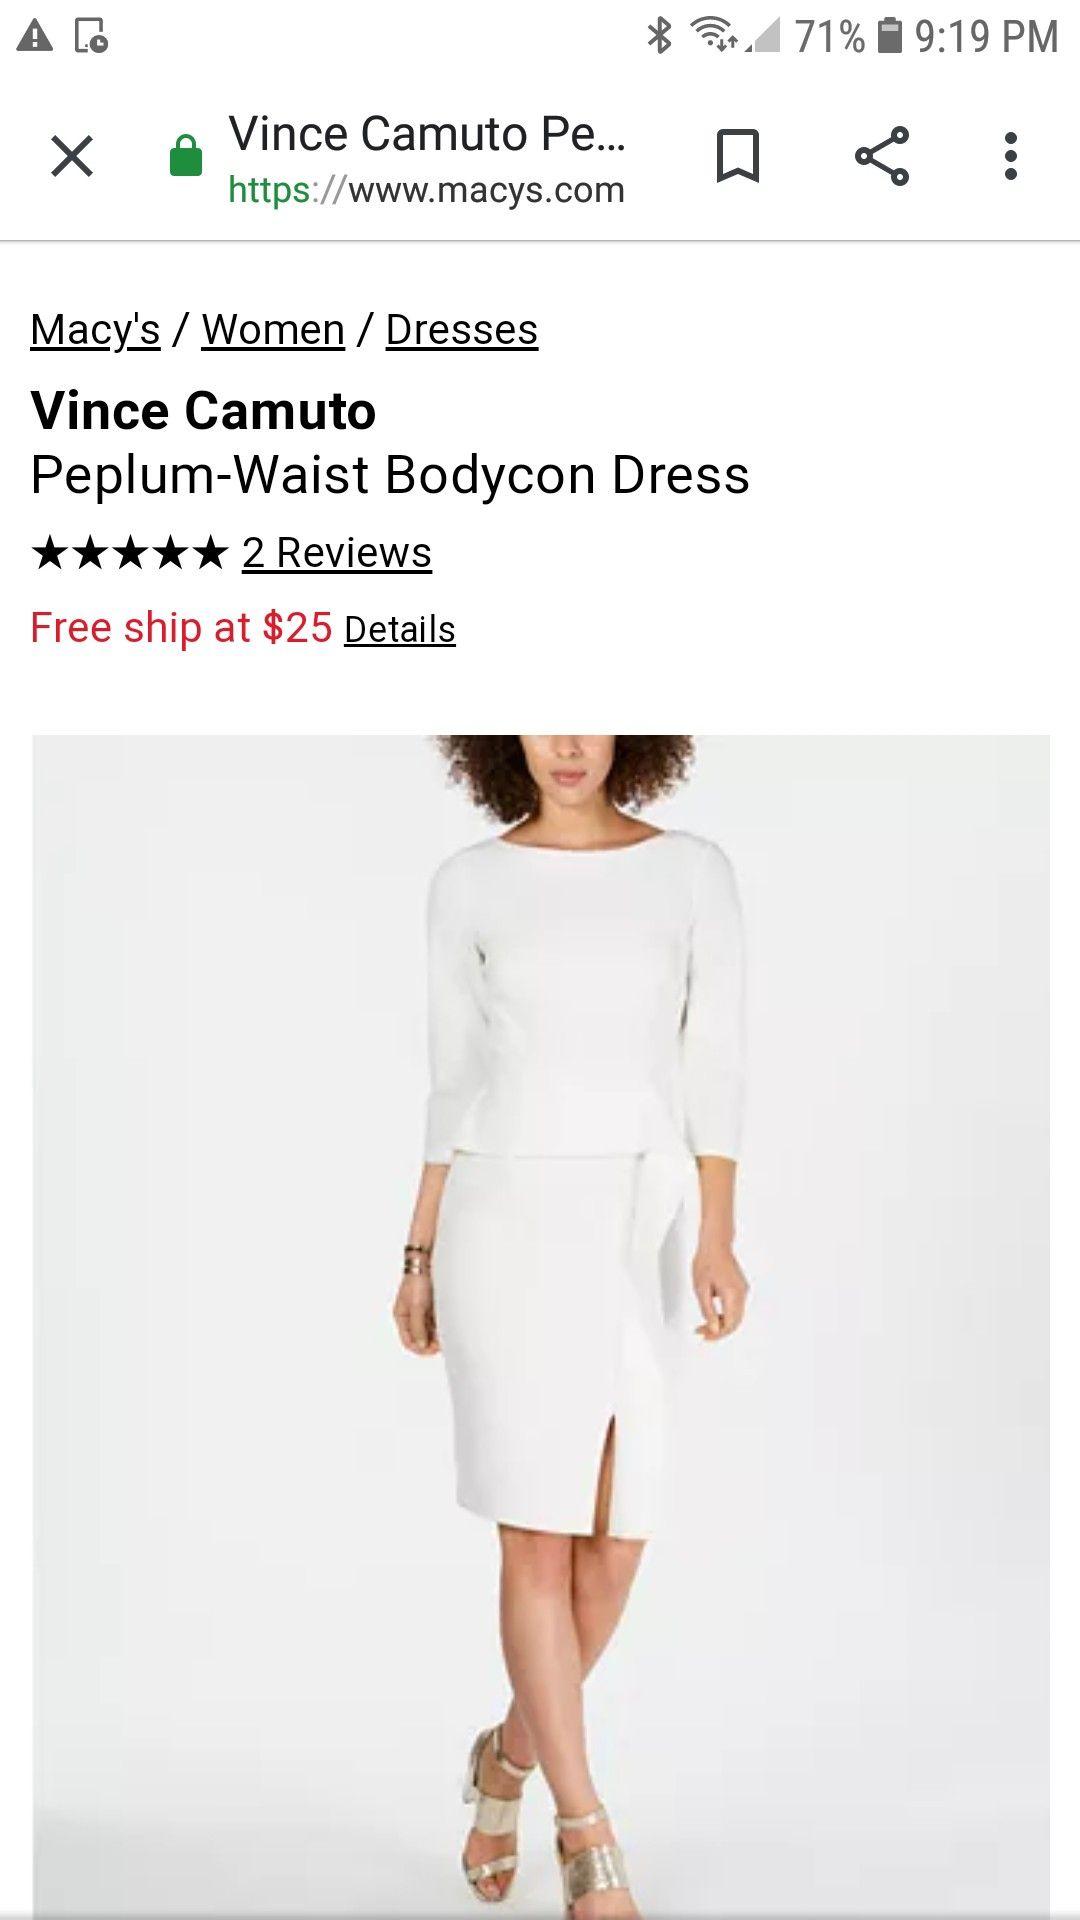 Pin By School On Graduation Bodycon Dress Fashion Womens Dresses [ 1920 x 1080 Pixel ]